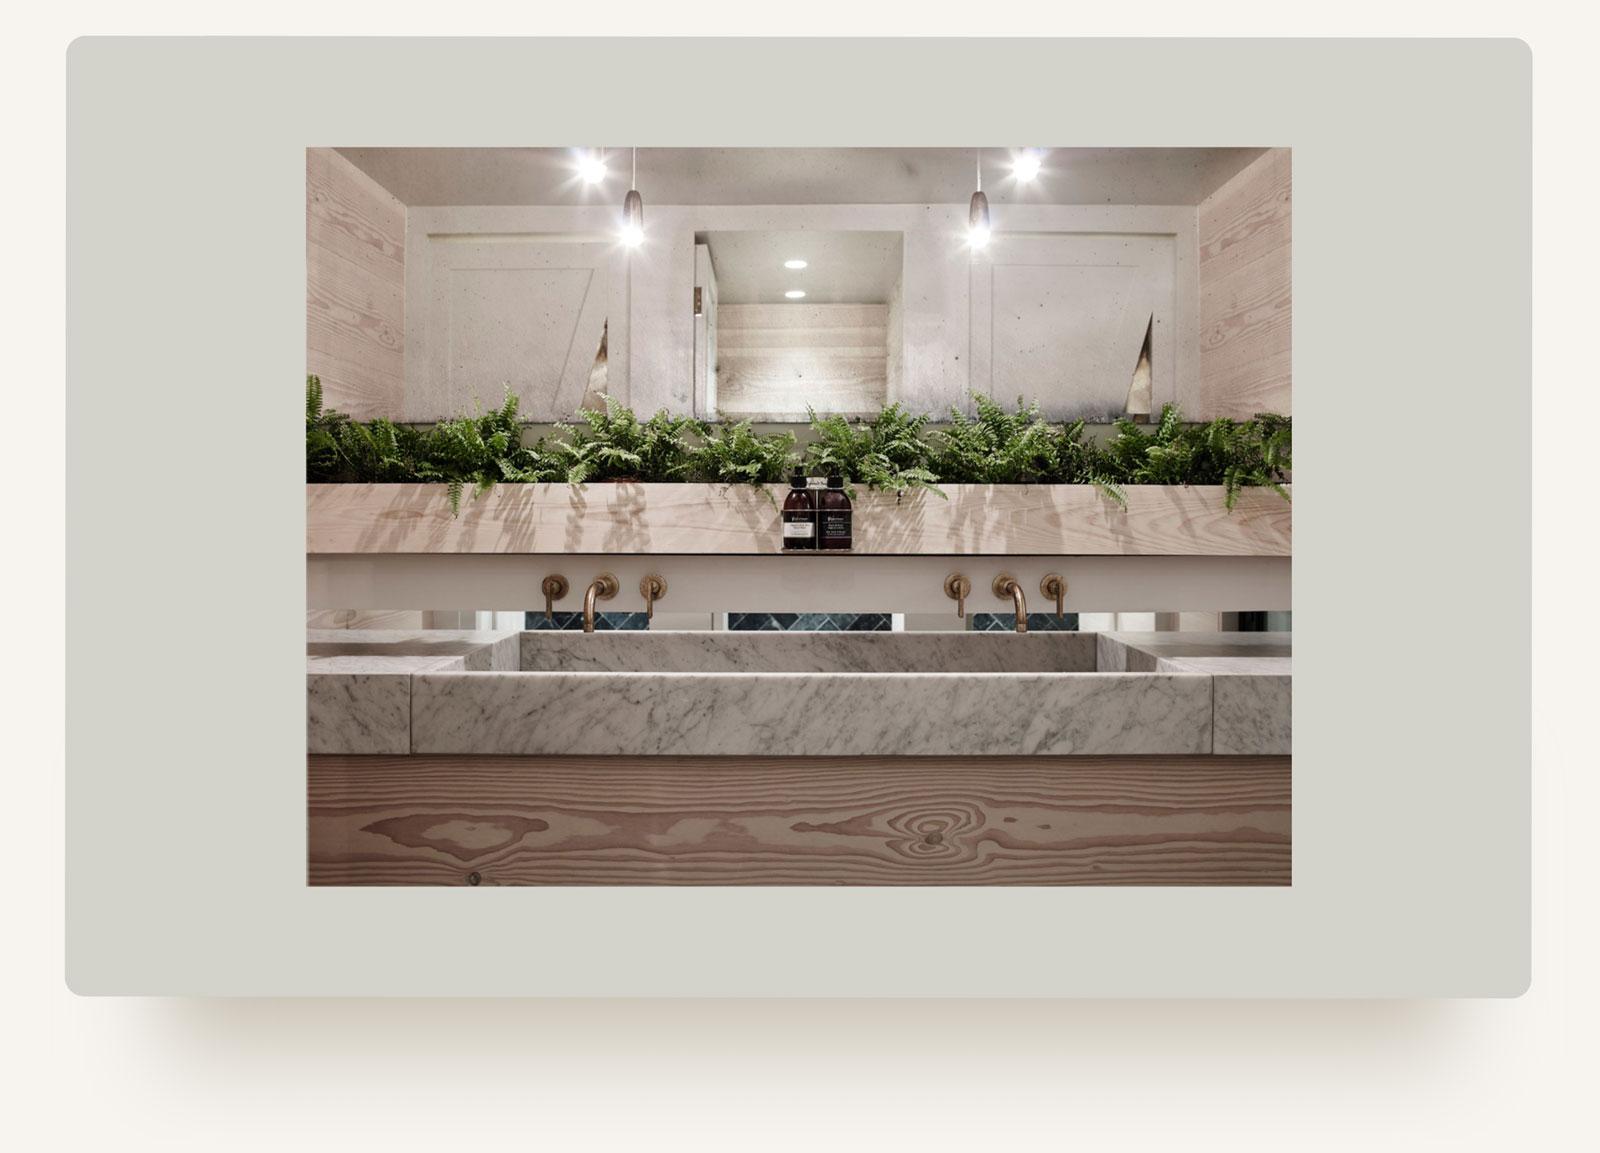 House of Grey interiors studio bathroom marble design in website design by Brittany Hurdle beckon webeckon